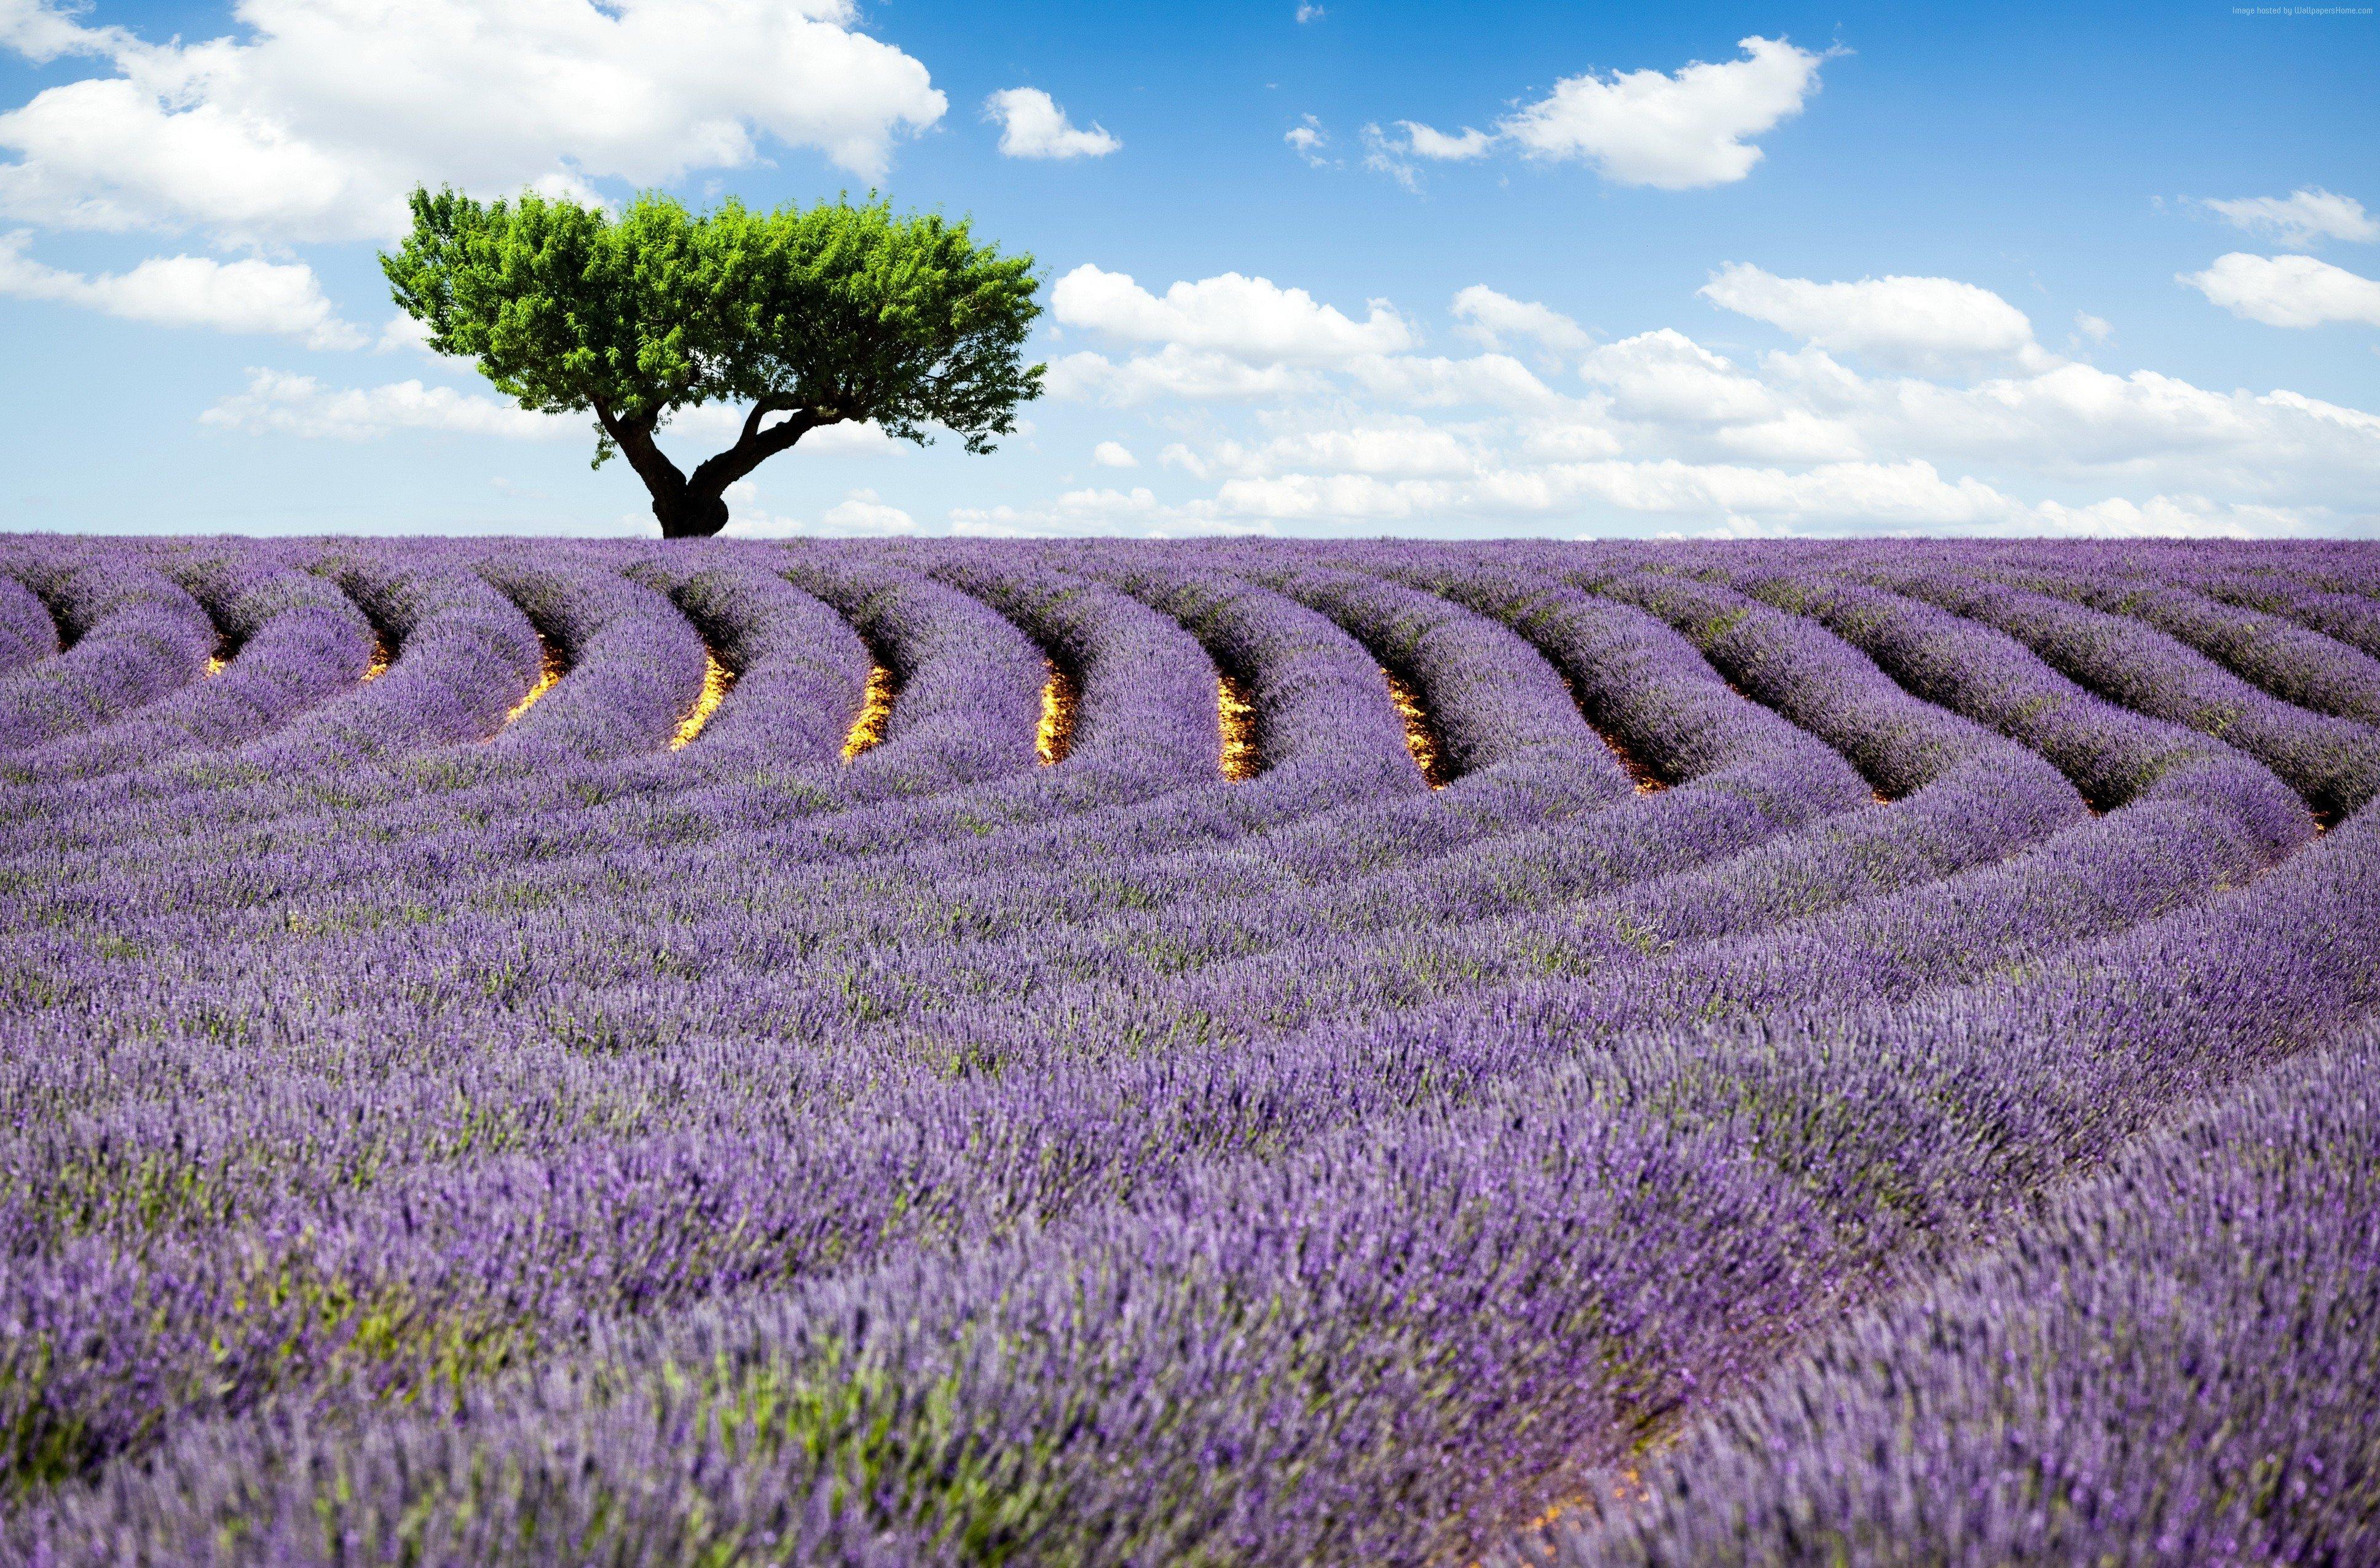 111239 France Lavender field tree 4k Meadows lavender 3872x2551